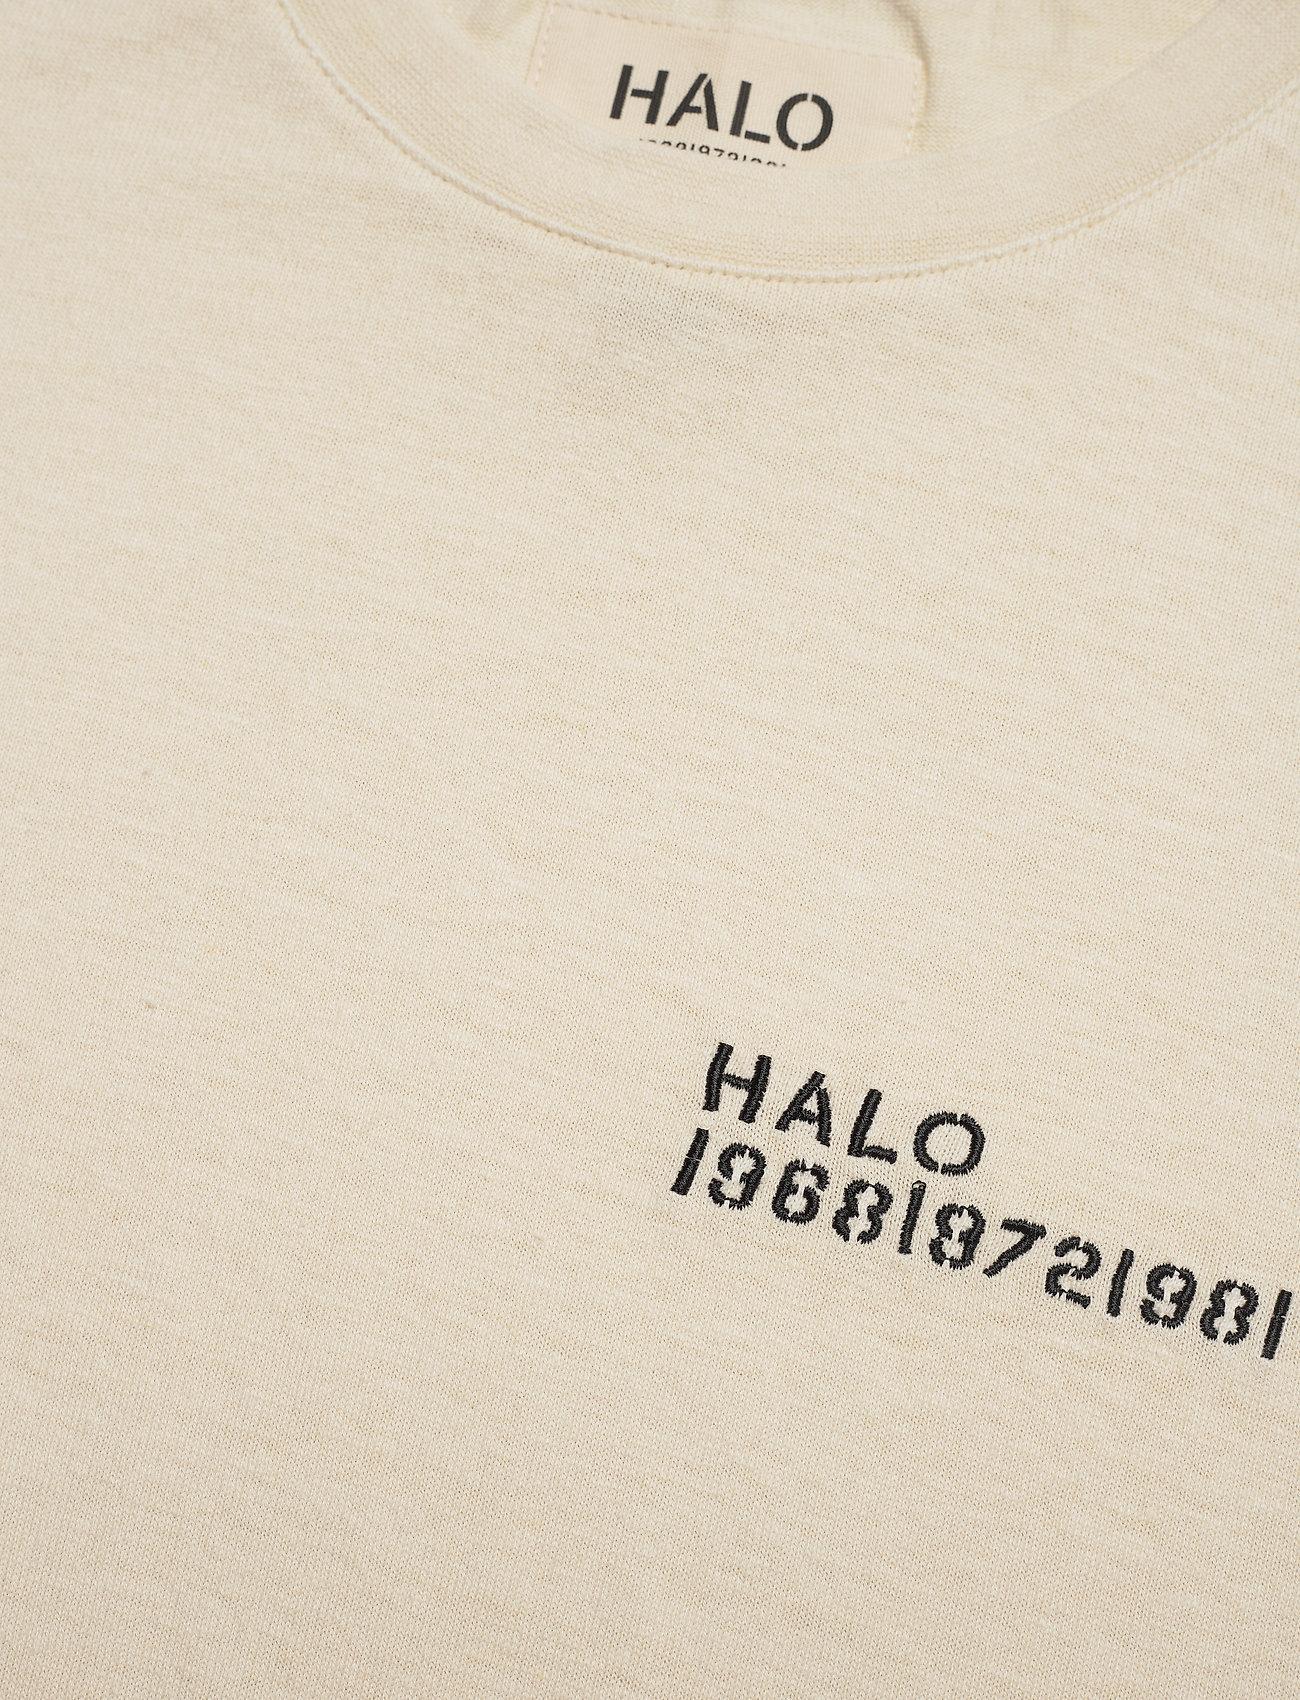 HALO HALO Hemp Tee - T-skjorter BONE WHITE - Menn Klær